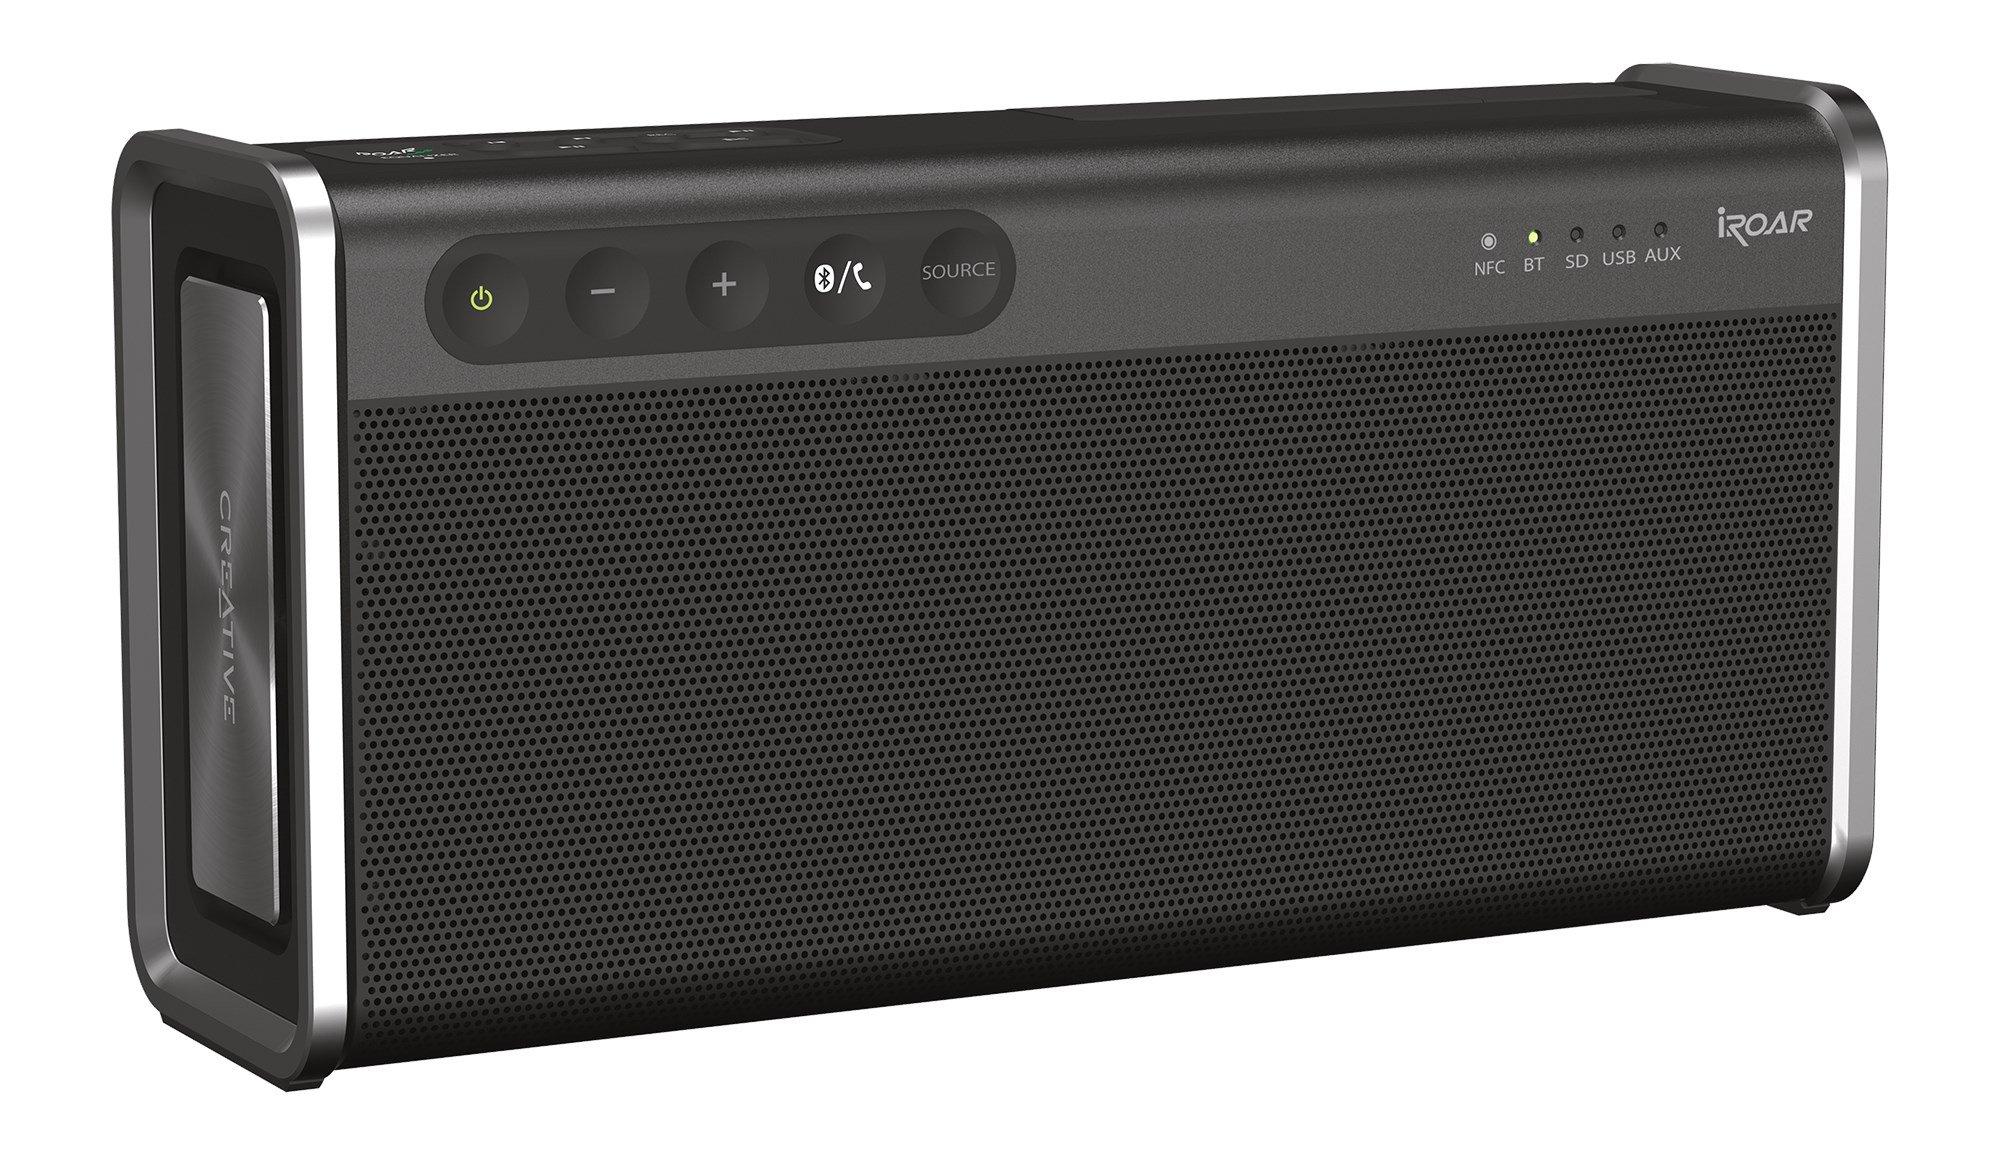 Creative iRoar Go Intelligent Splash-proof Portable 5-Driver Bluetooth Speaker with SuperWide Technology